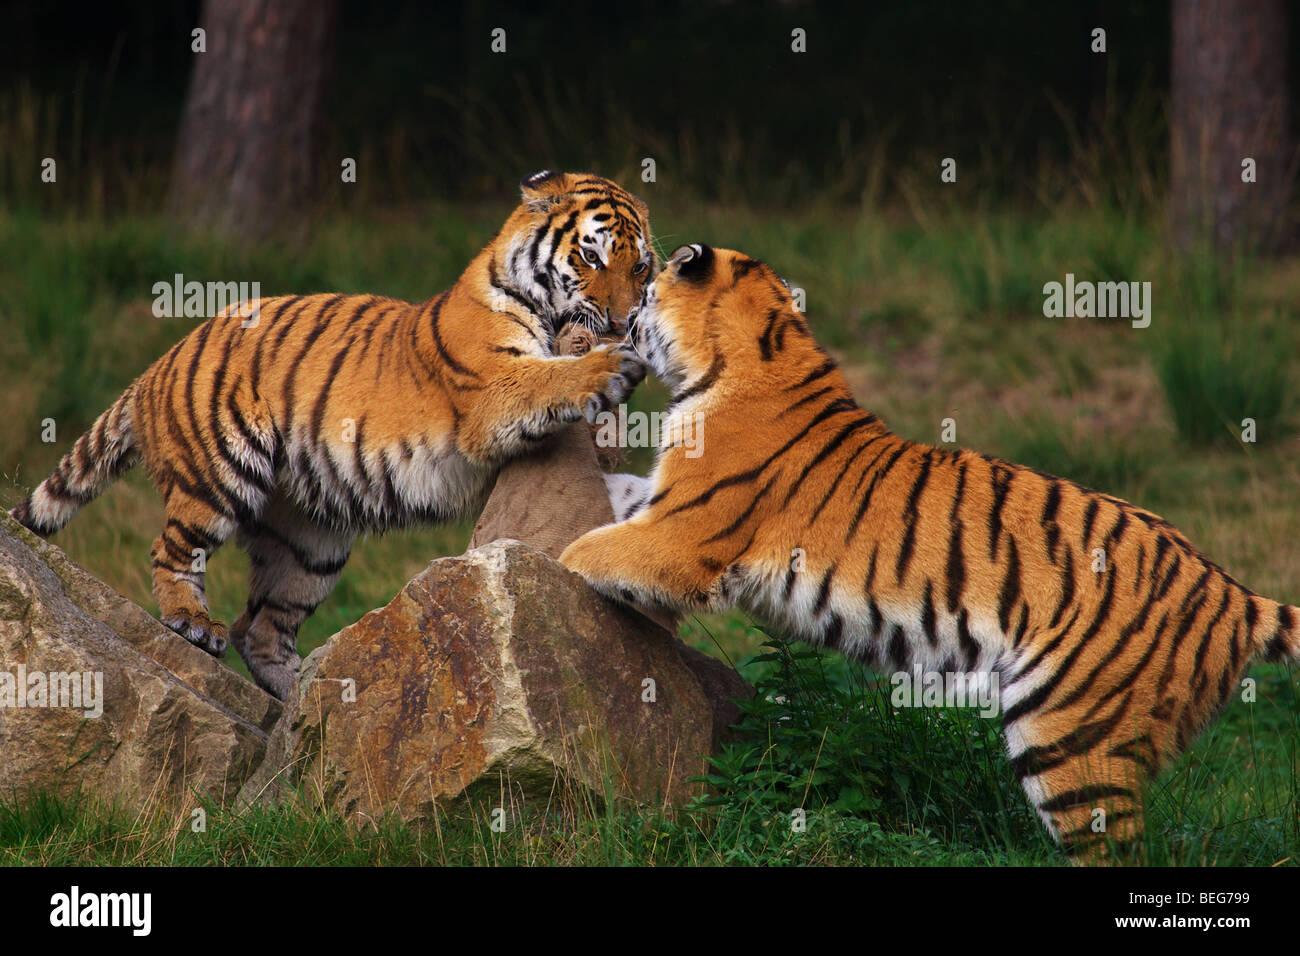 Jugando dos tigres siberianos en frente de un bosque oscuro Imagen De Stock